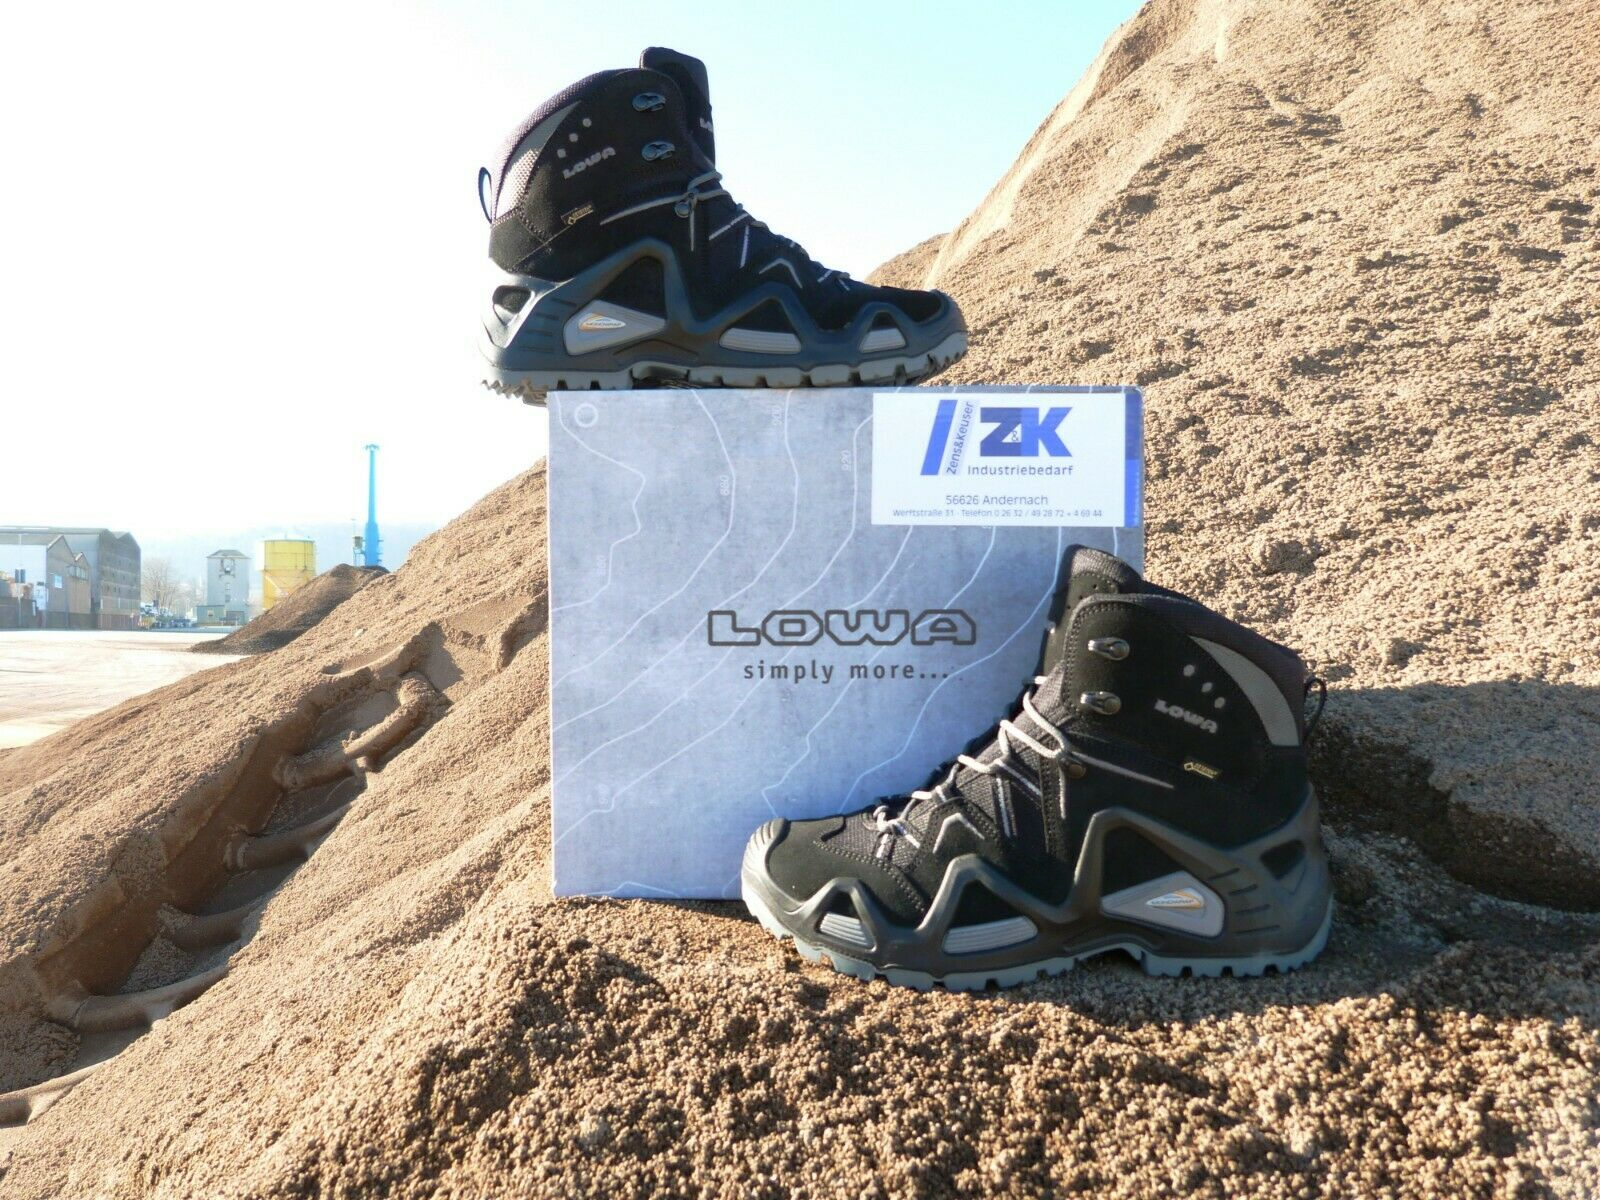 LOWA Wanderschuhe Rex Mid GORETEX Schuhe Schuhe Schuhe Trekking Wandern Blau oder Schwarz 3557bf